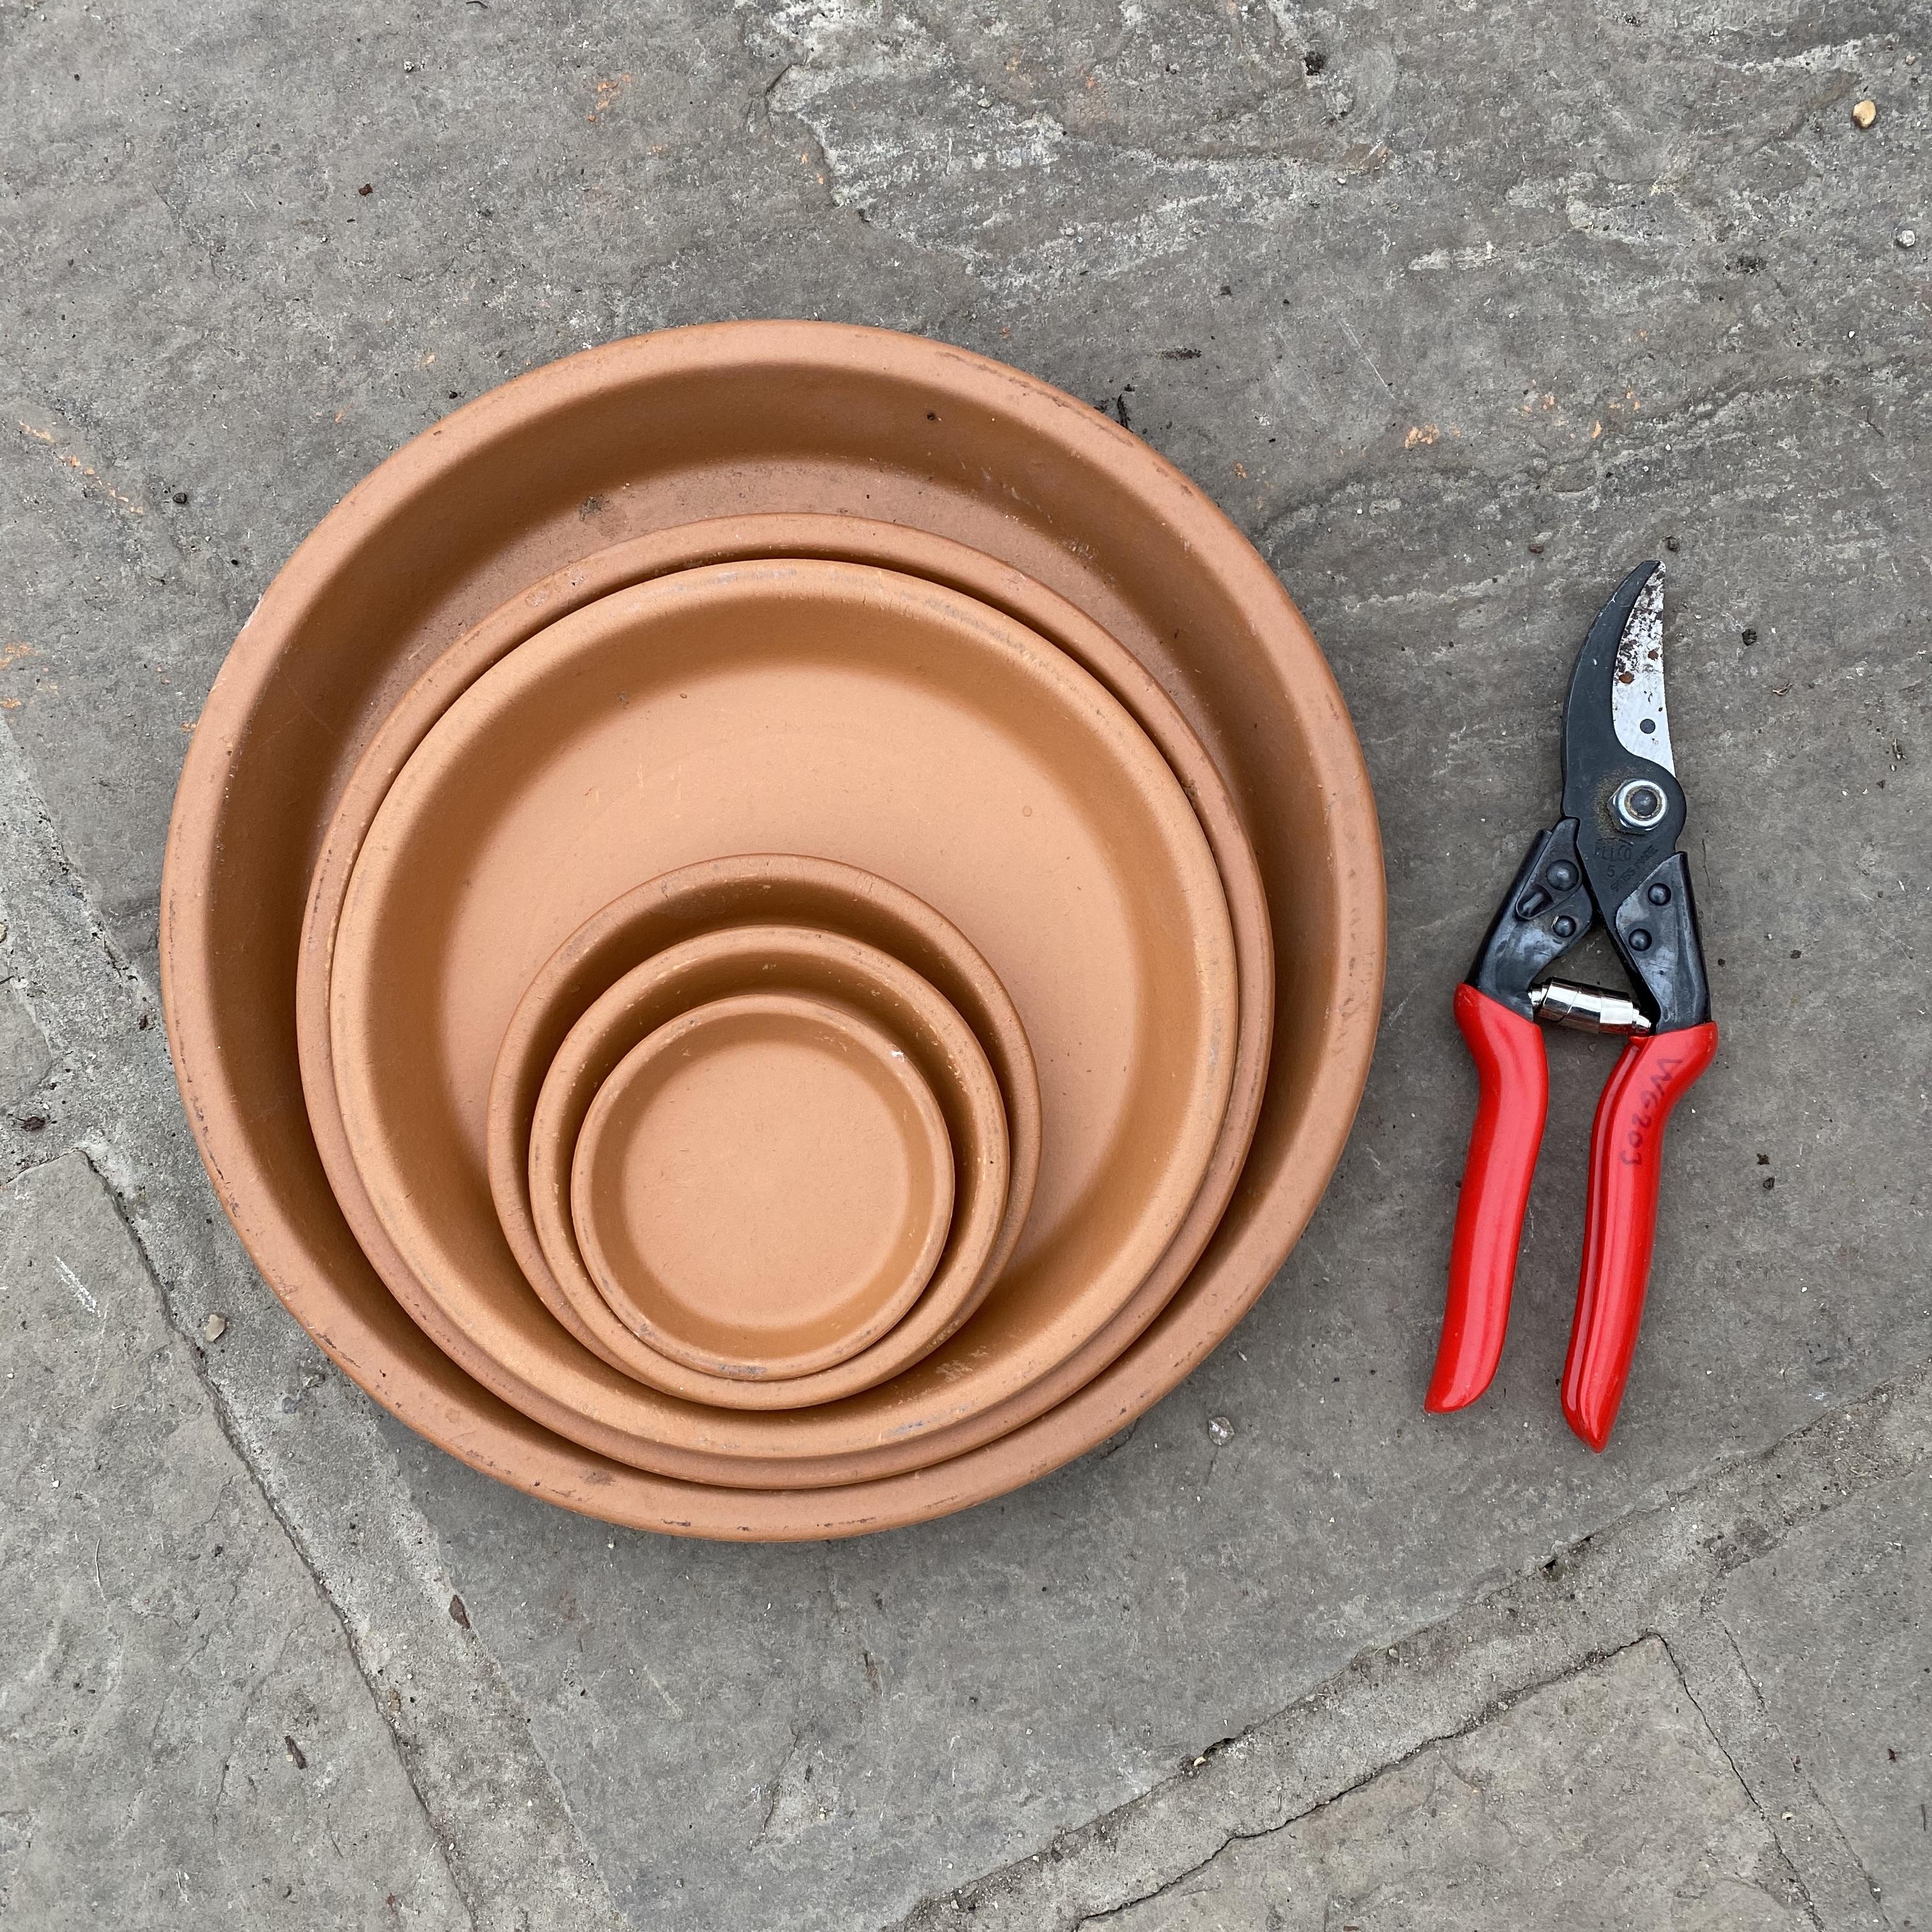 Terracotta Saucer - 12 Sizes